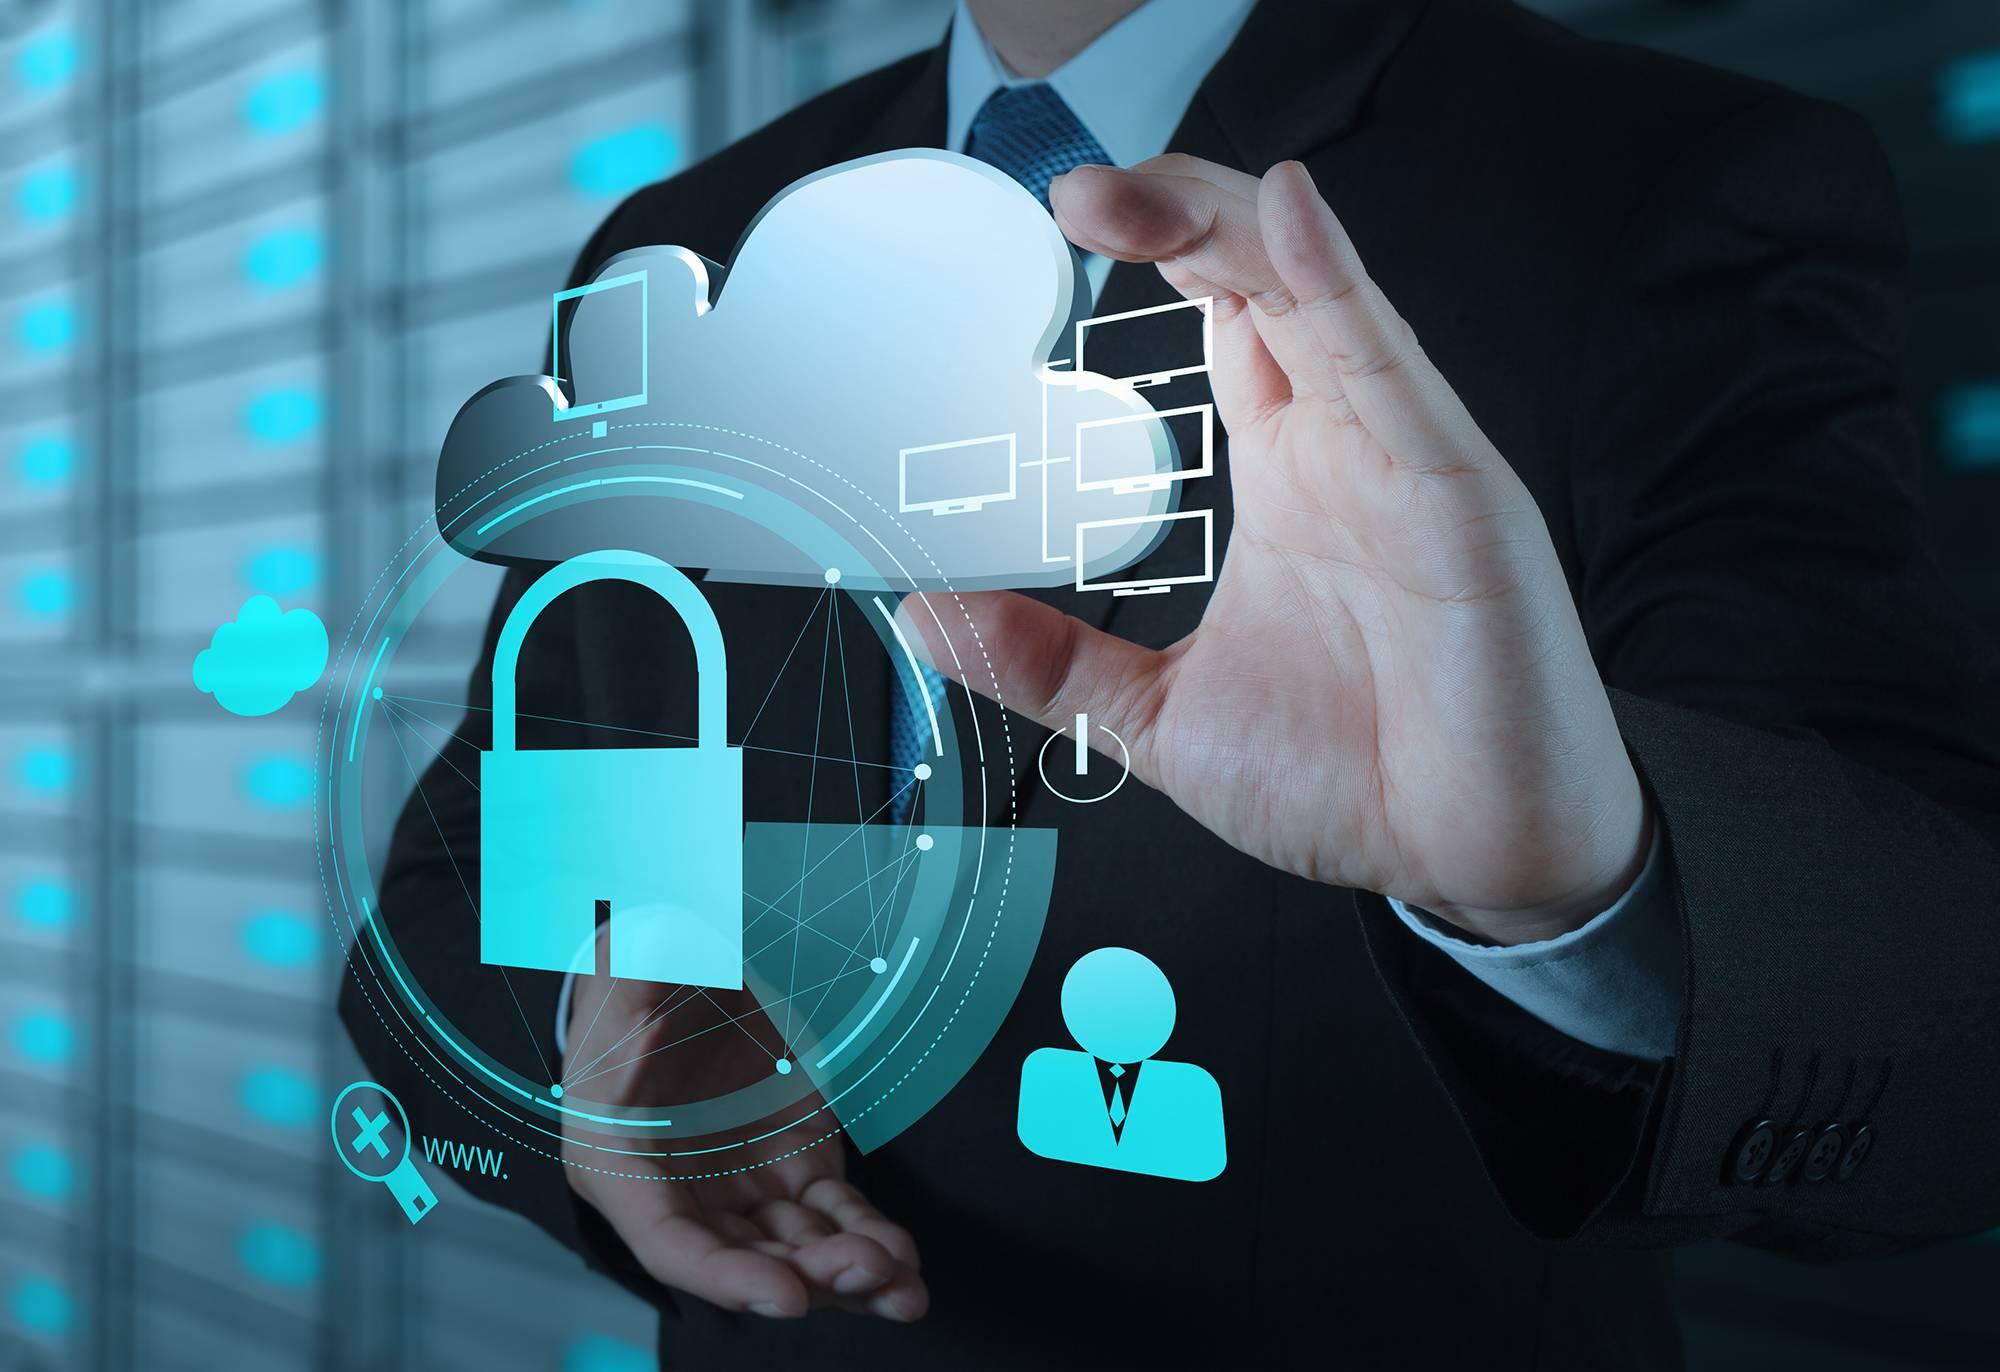 zdns cloud支持全局负载均衡和鼓掌切换